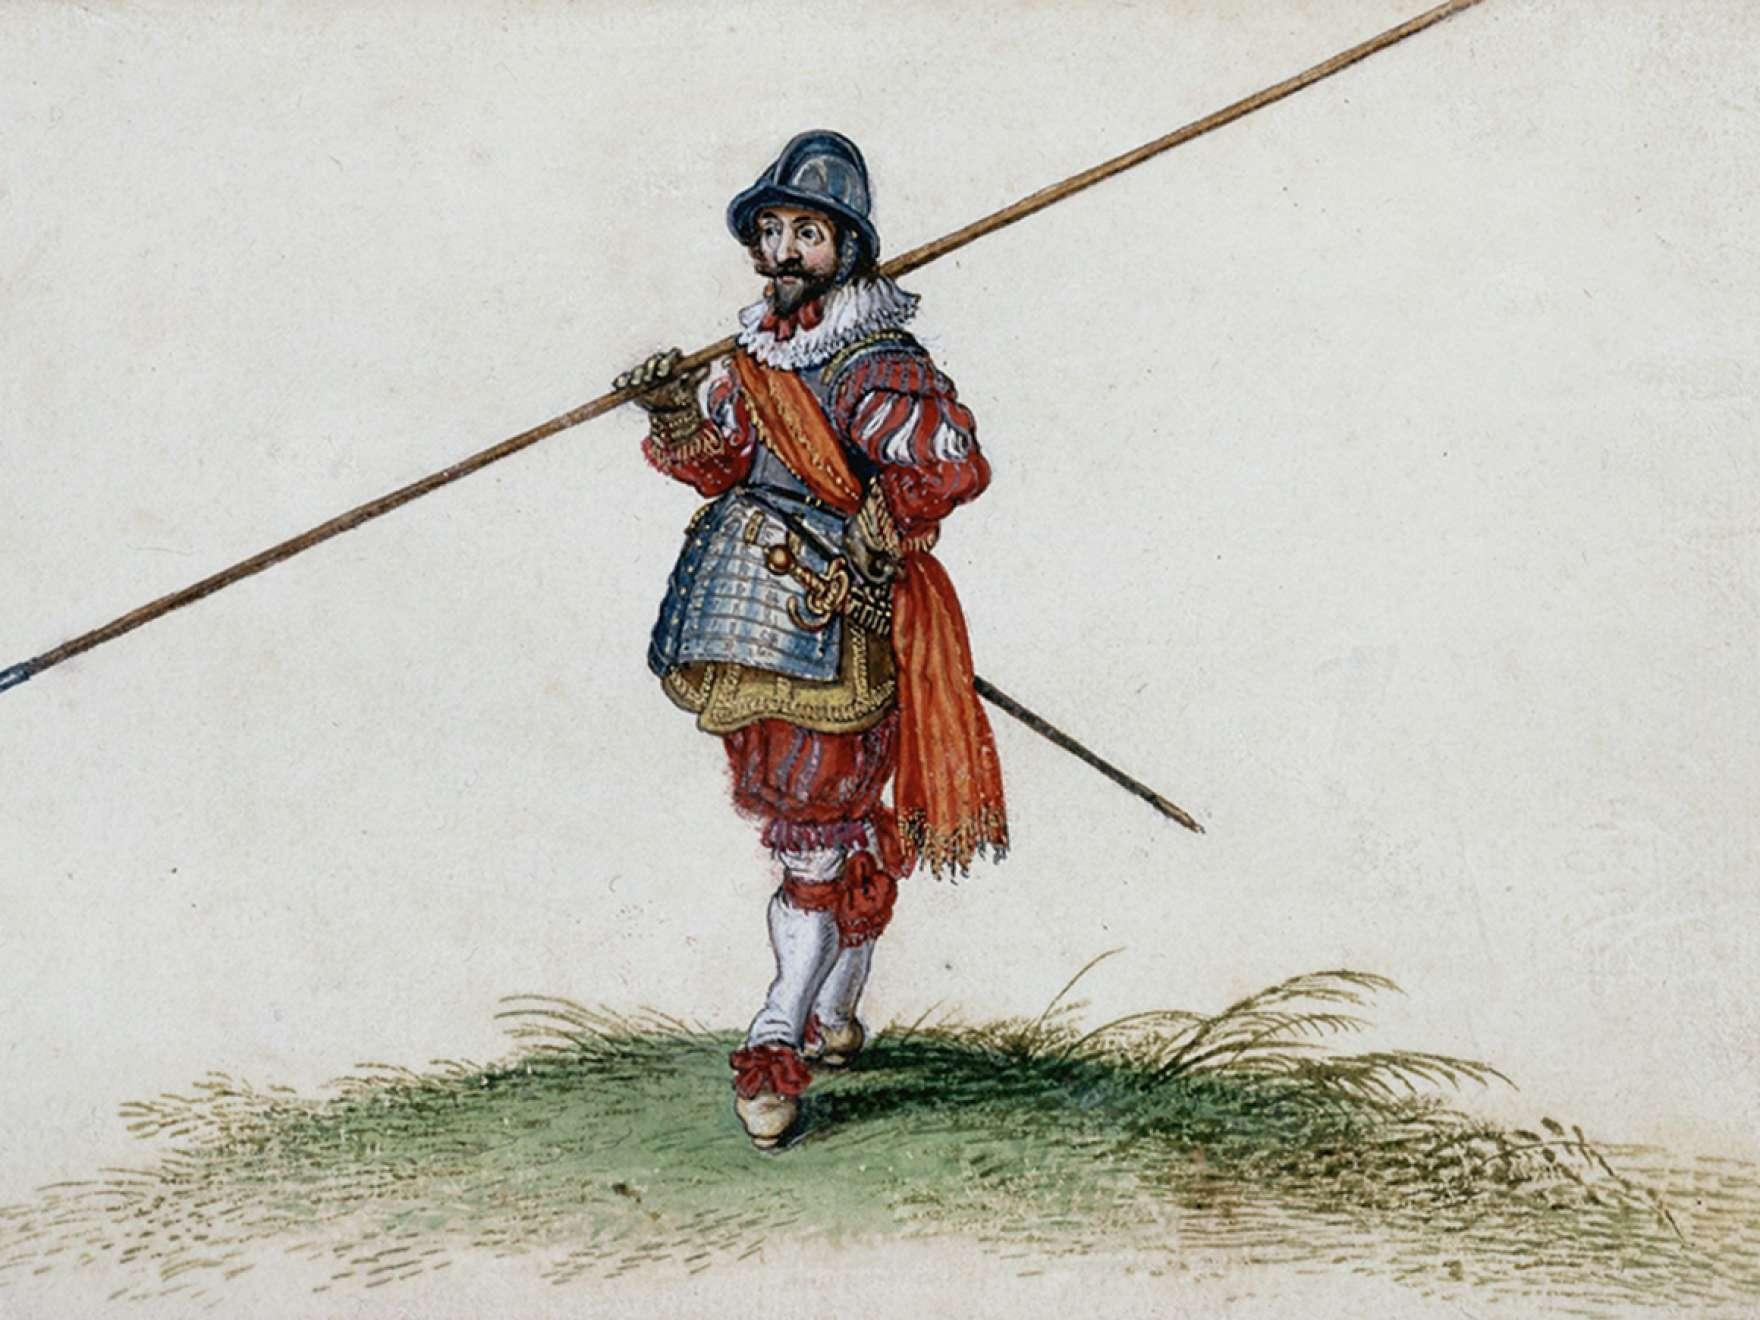 Adriaen Van De Venne, Watercolor (A Pikeman), 1625